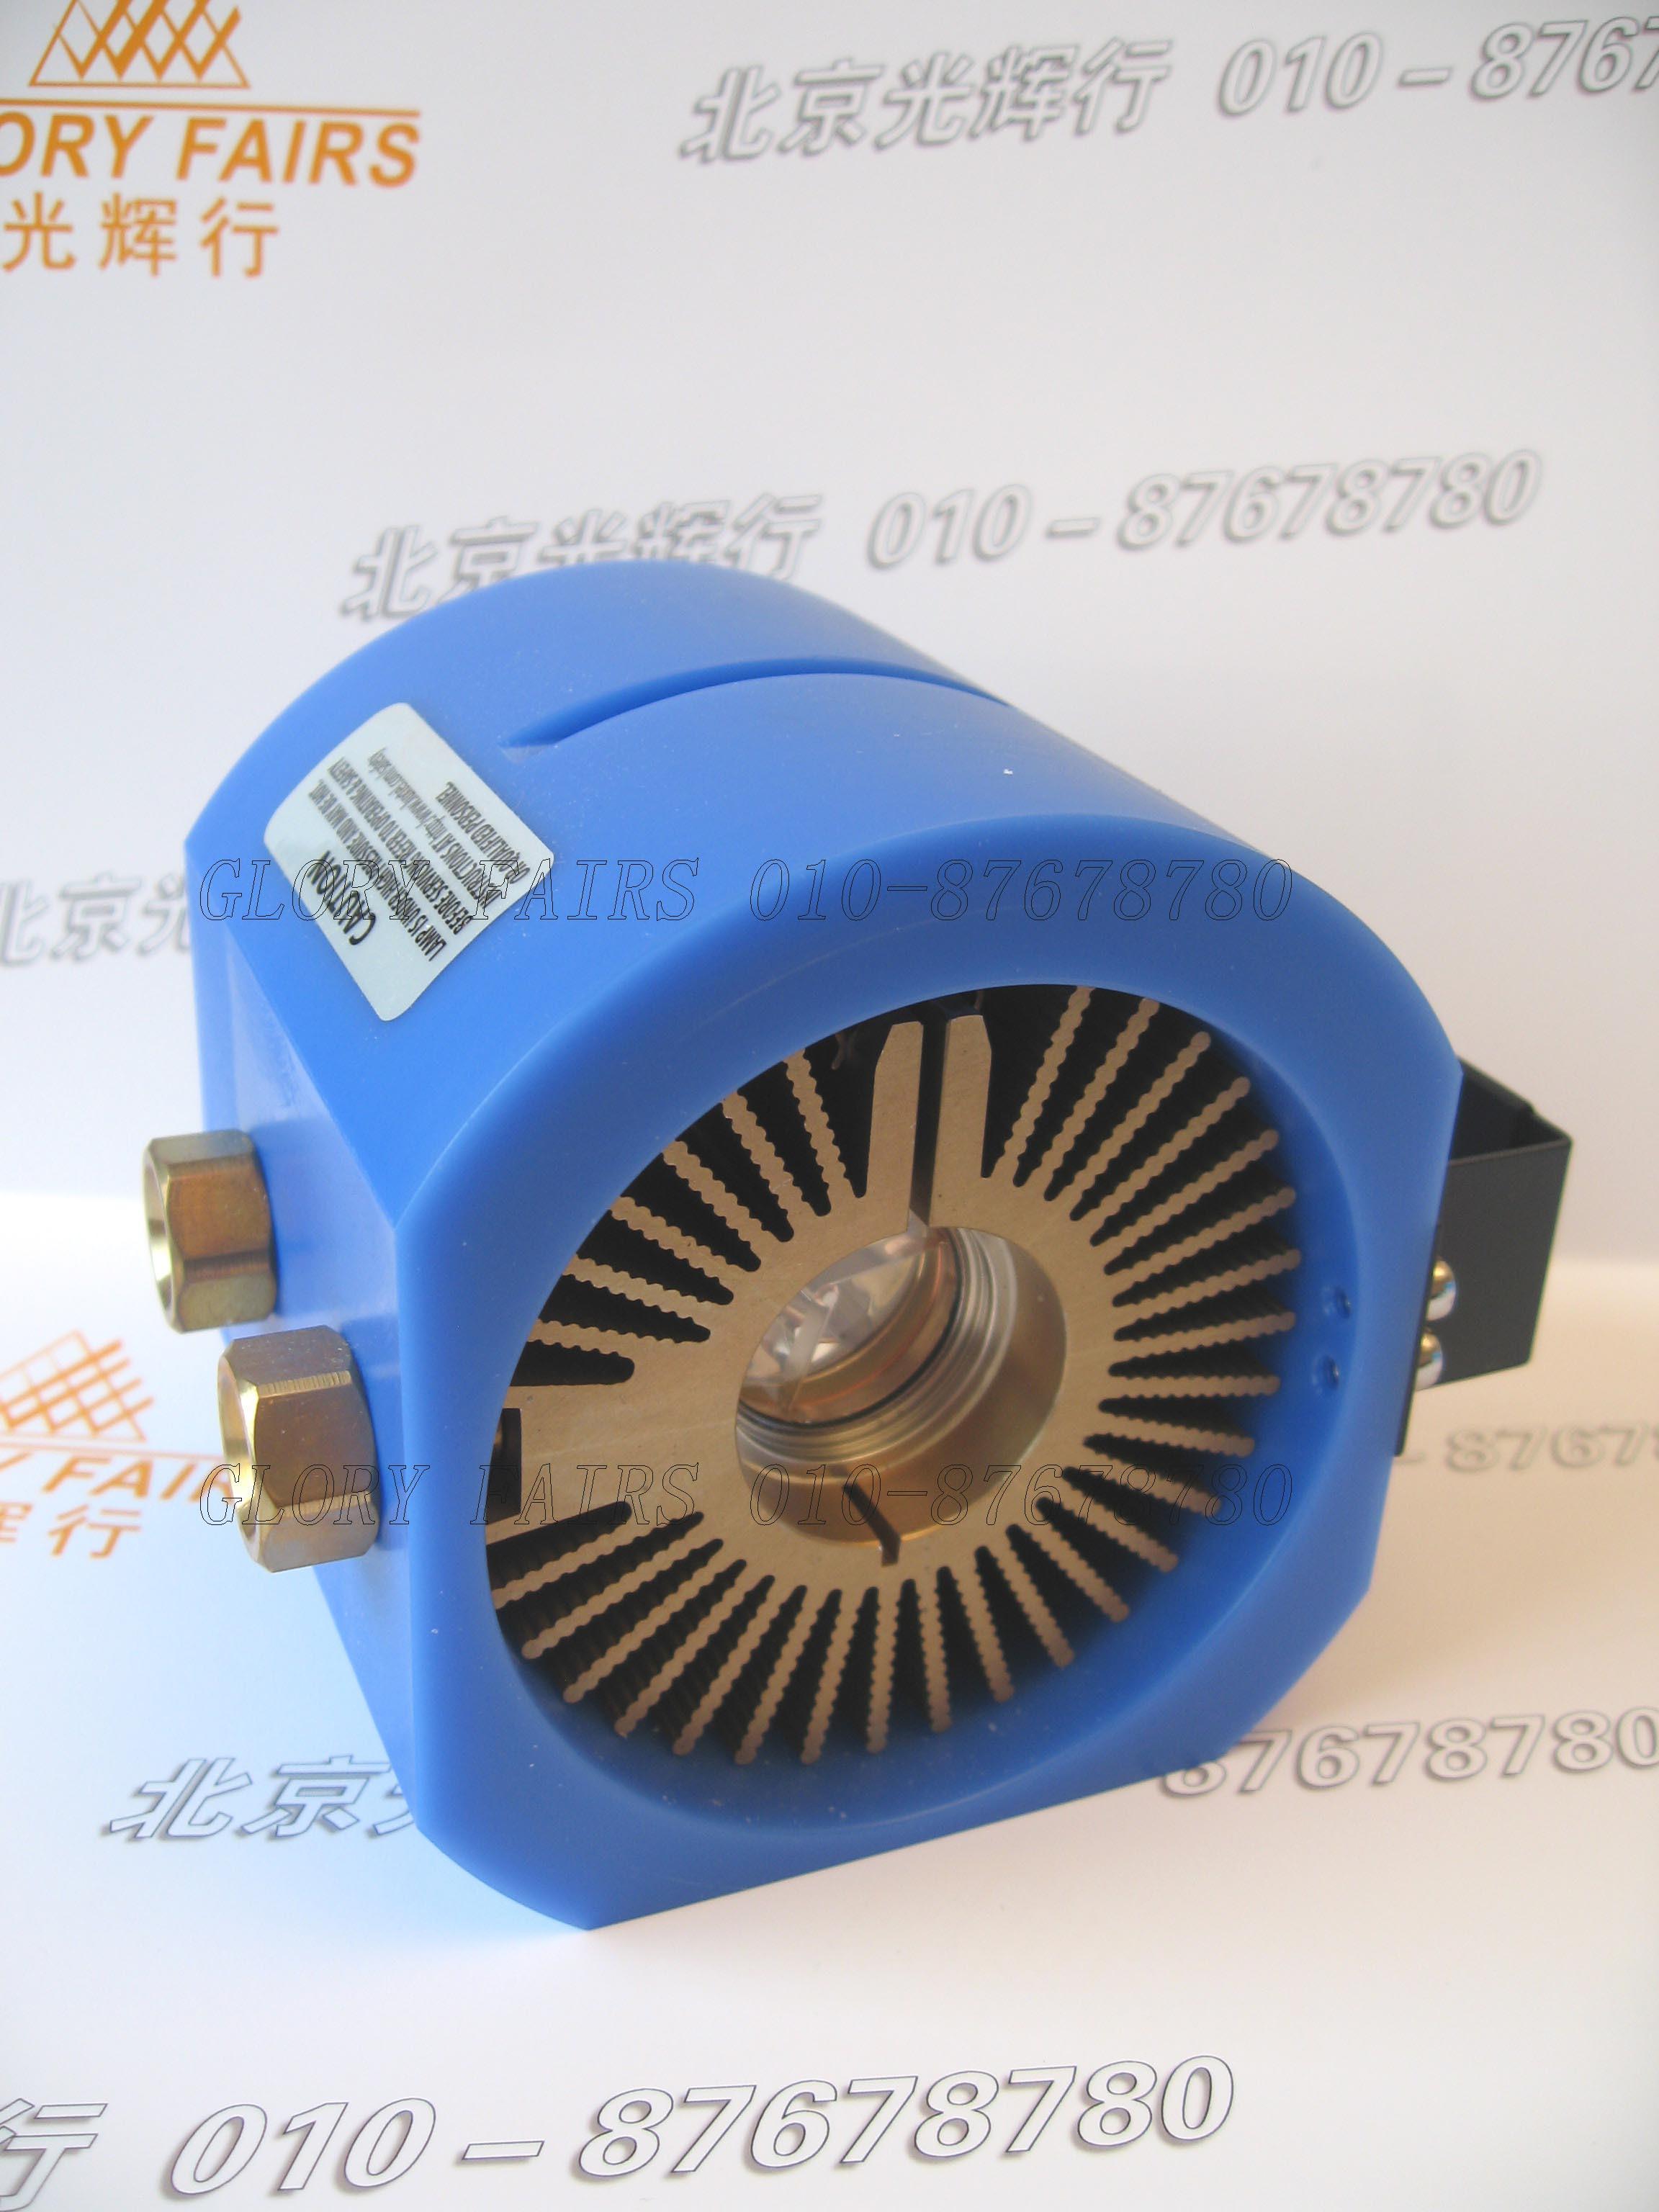 300W replacement xenon lamp module,Alternative Stryker X6000 endoscope light source,220-185-300 bulb unit heat sinker housing(China (Mainland))